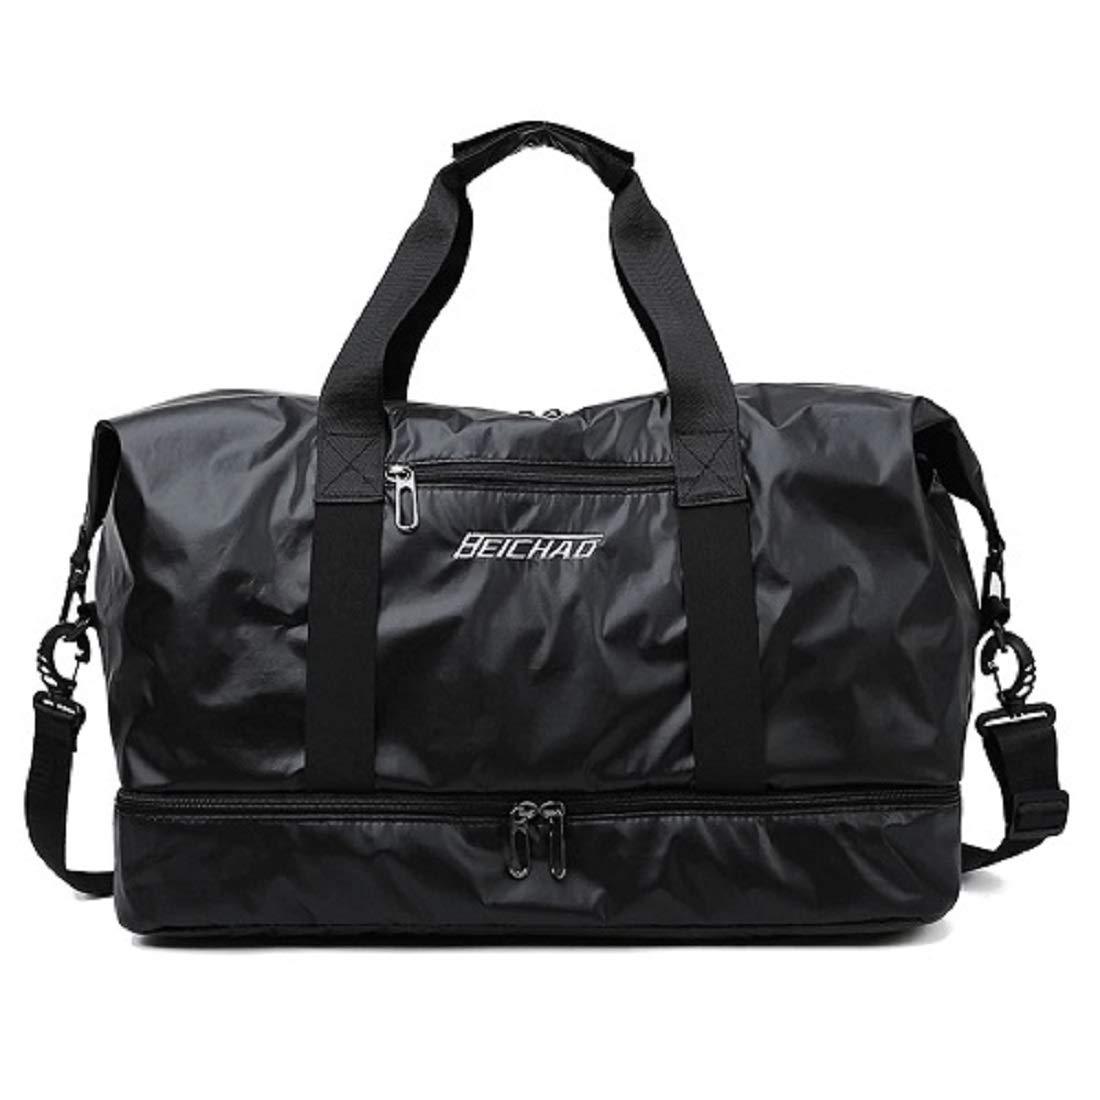 6c743fc540c0 Ladies sports bag womens gym bags sports holdalls gym duffel bags